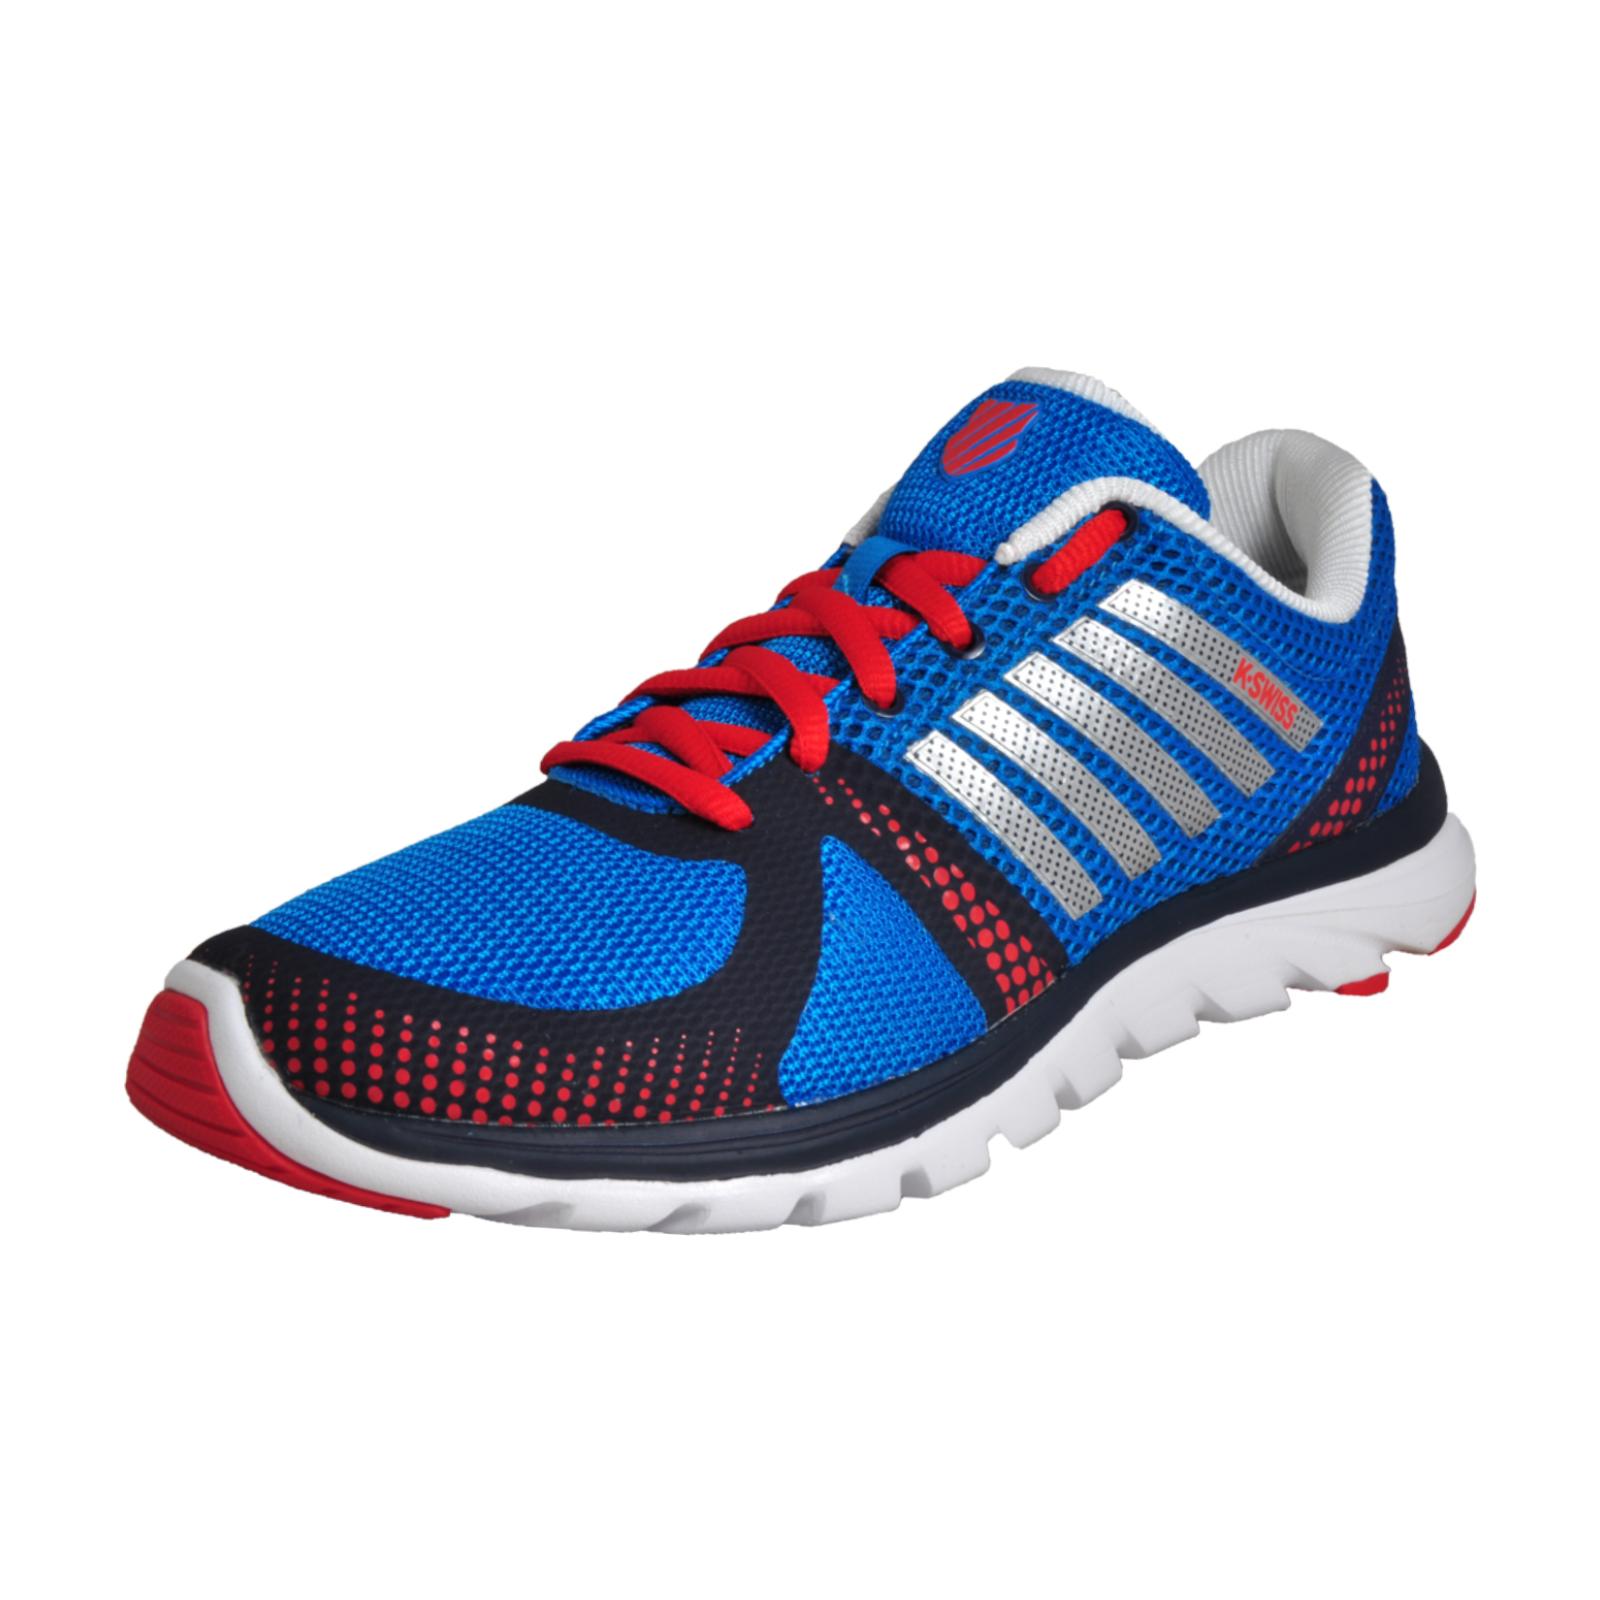 Lite K Gym Trainers Shoes Blue X Men s Blades Running Fitness Swiss SrwatSqF 40abd2ed4a9